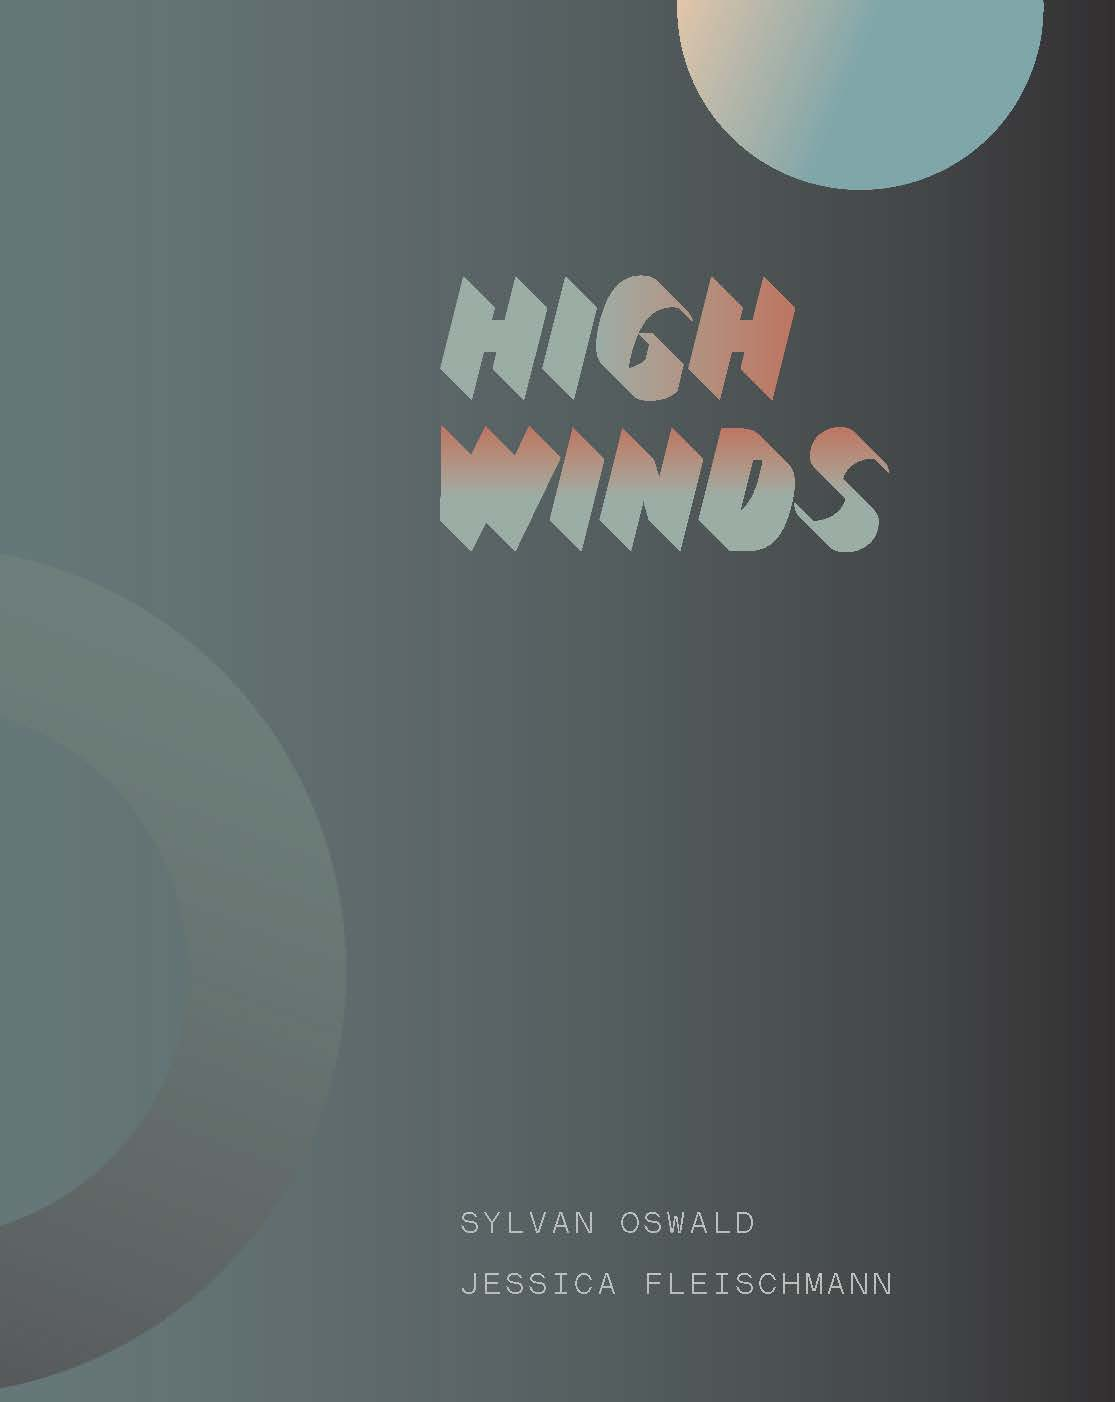 HighWinds_Cover.Jpg